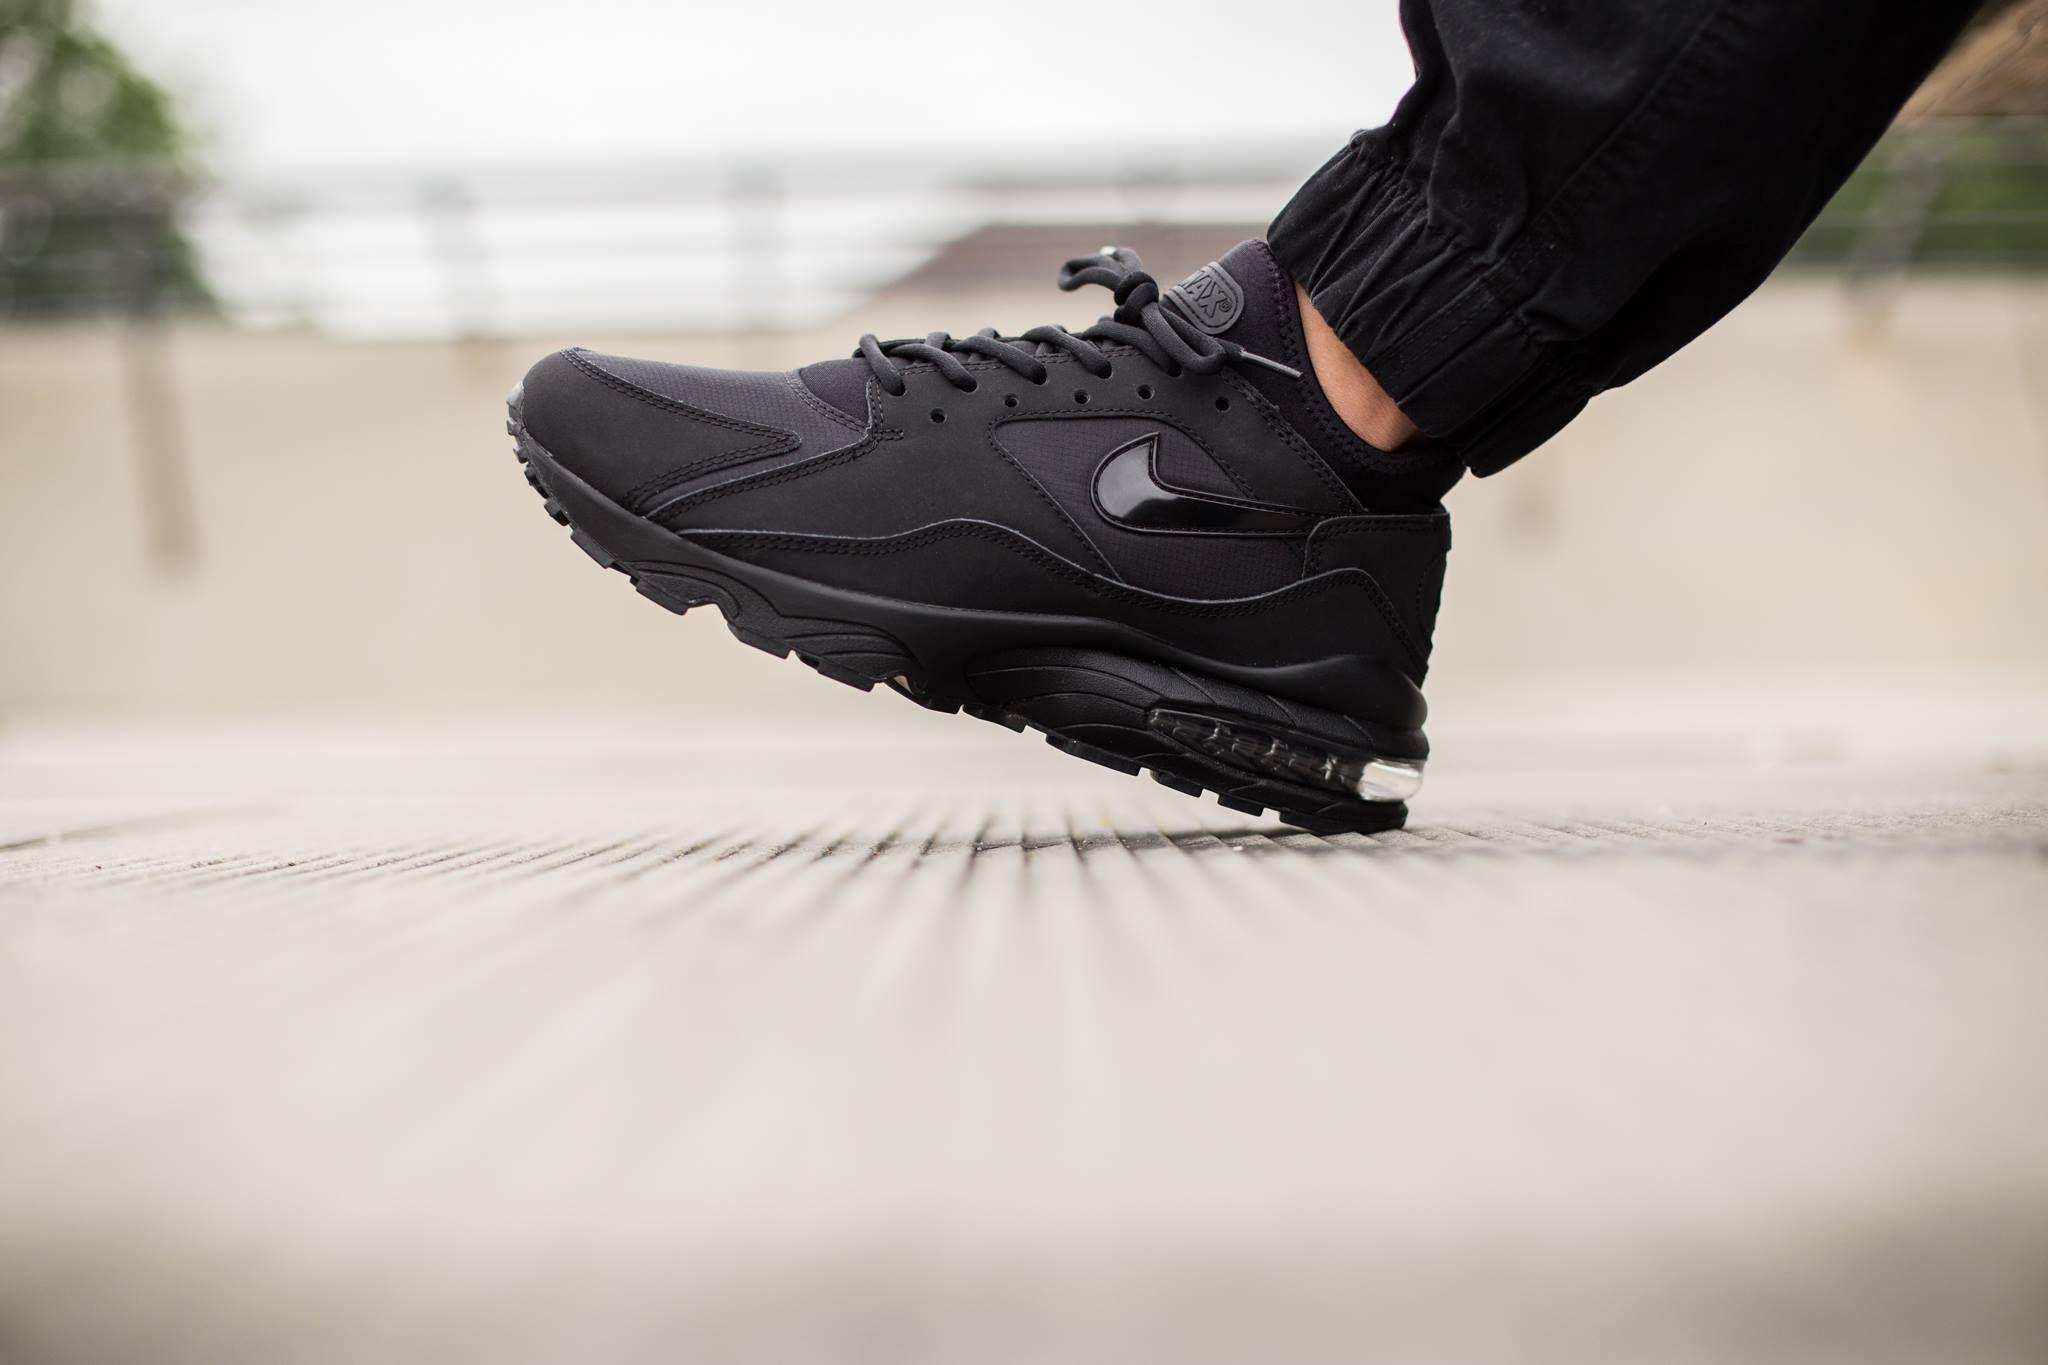 Картинки по запросу Nike Air Max Plus black on foot Картинки